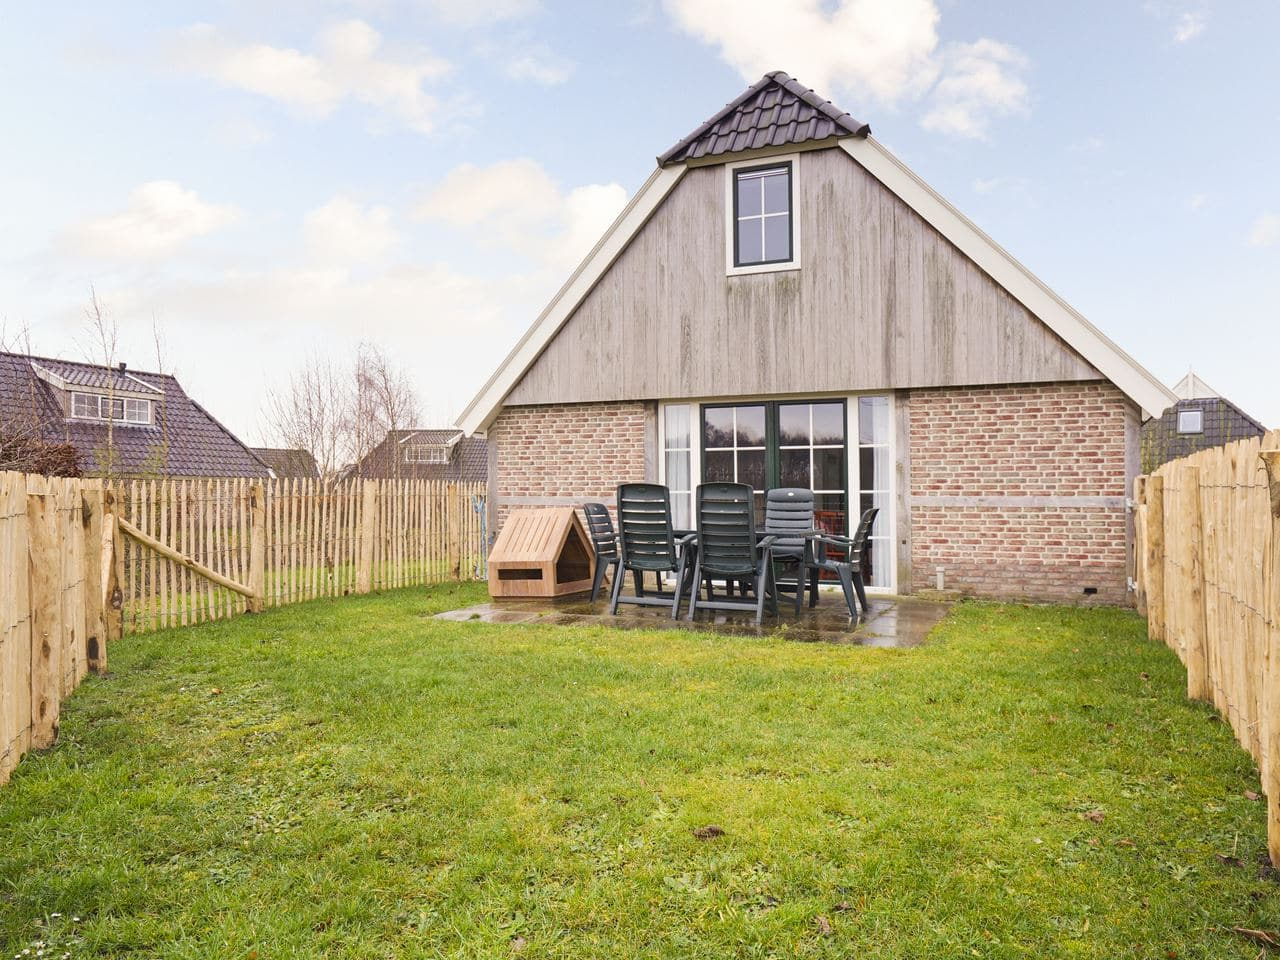 Hondenbungalow Orveltemarke 6CD - Nederland - Drenthe - 6 personen - omheinde tuin